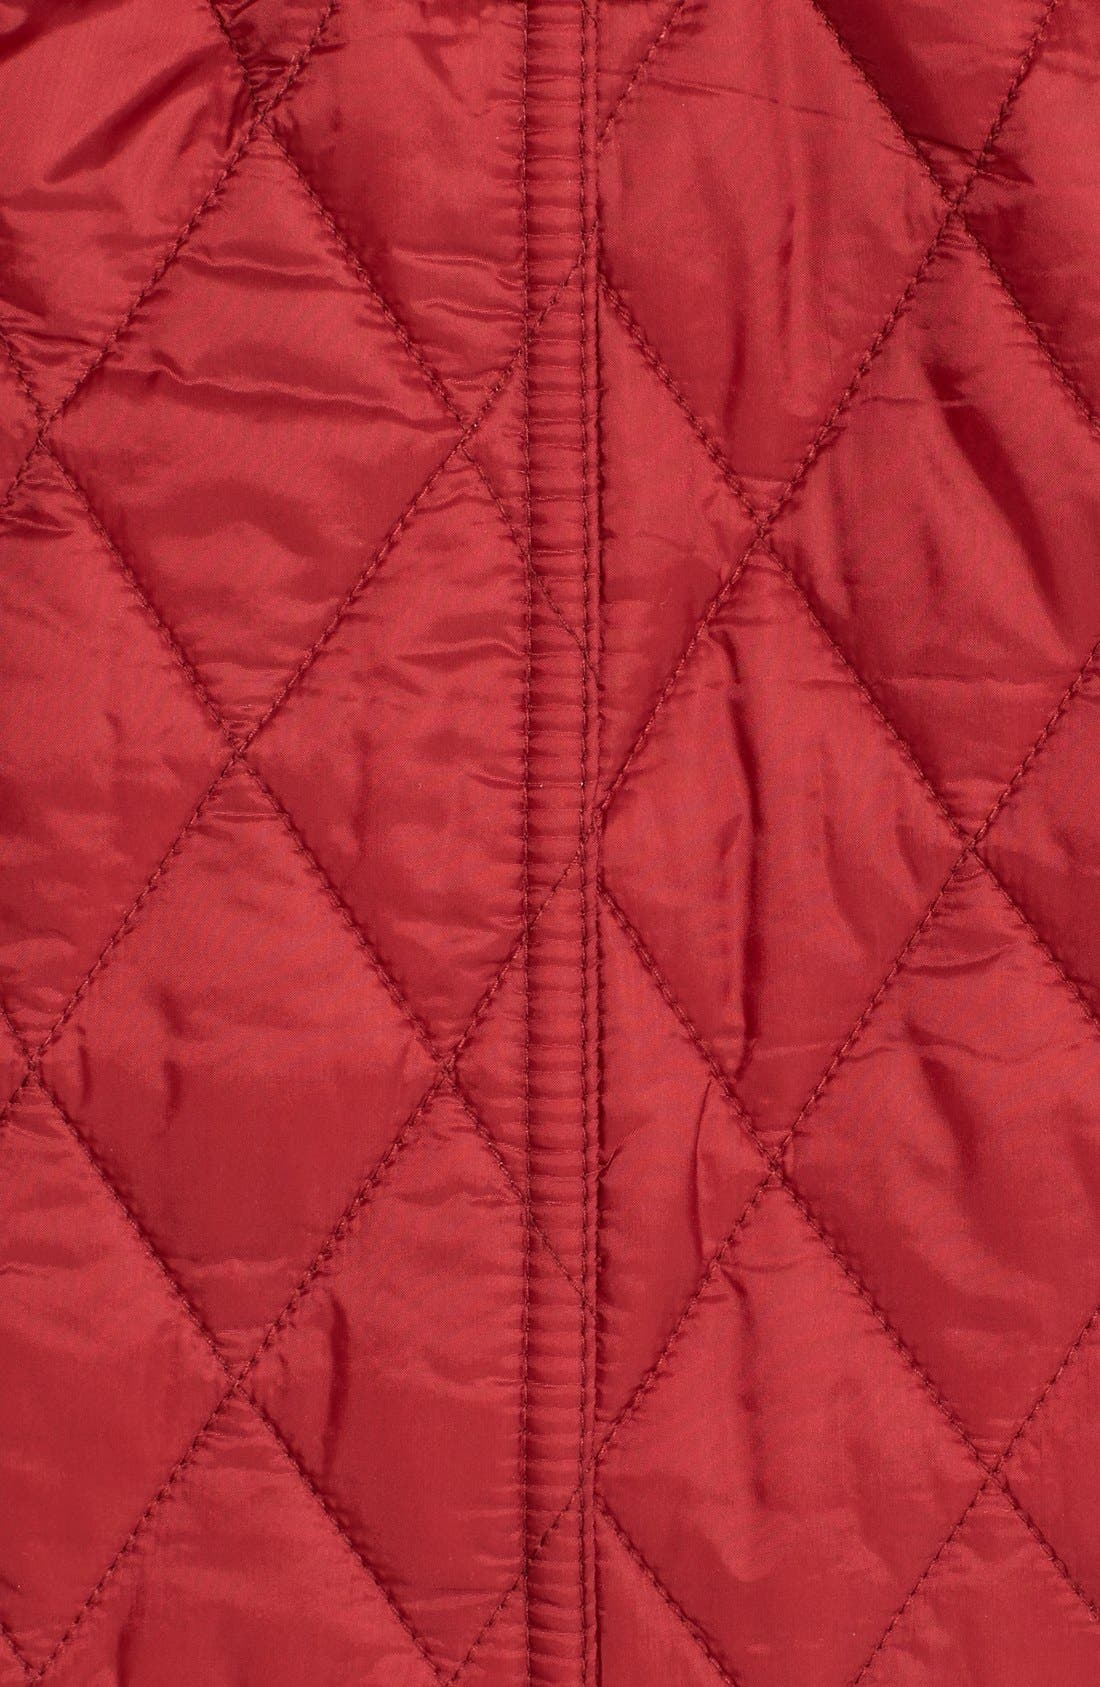 Finsbridge ShortQuilted Jacket,                             Alternate thumbnail 12, color,